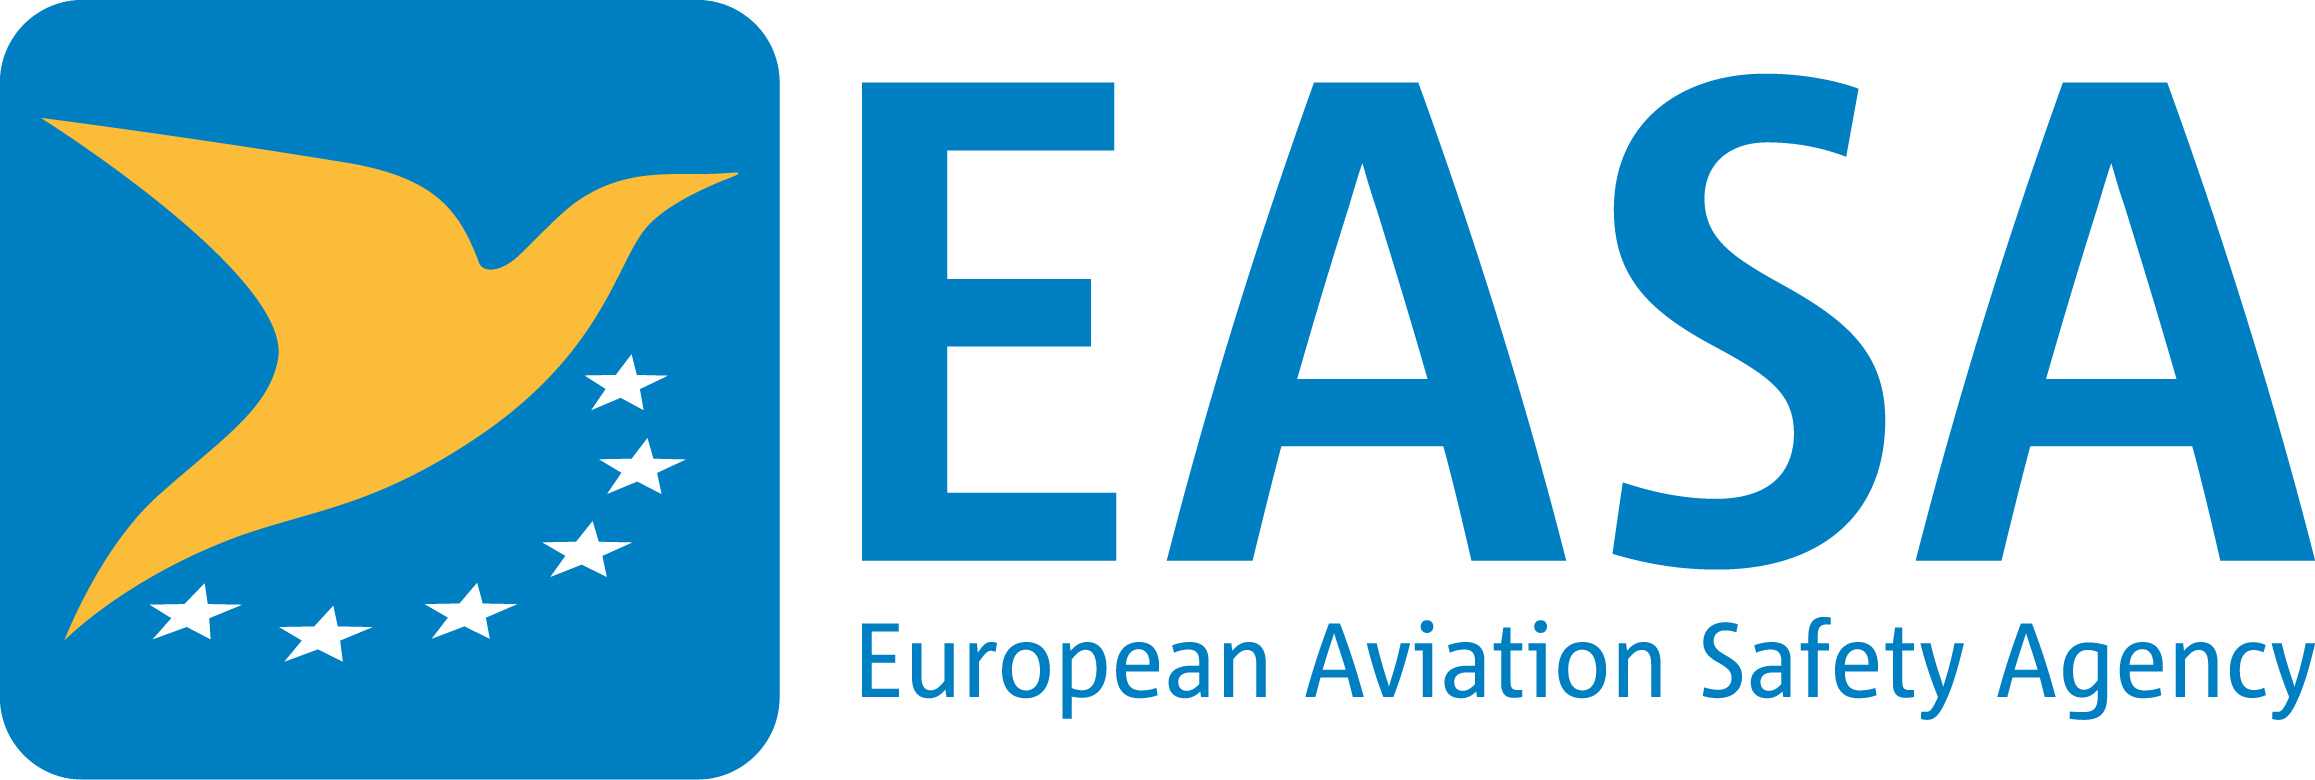 EASA_Logo jpg white background